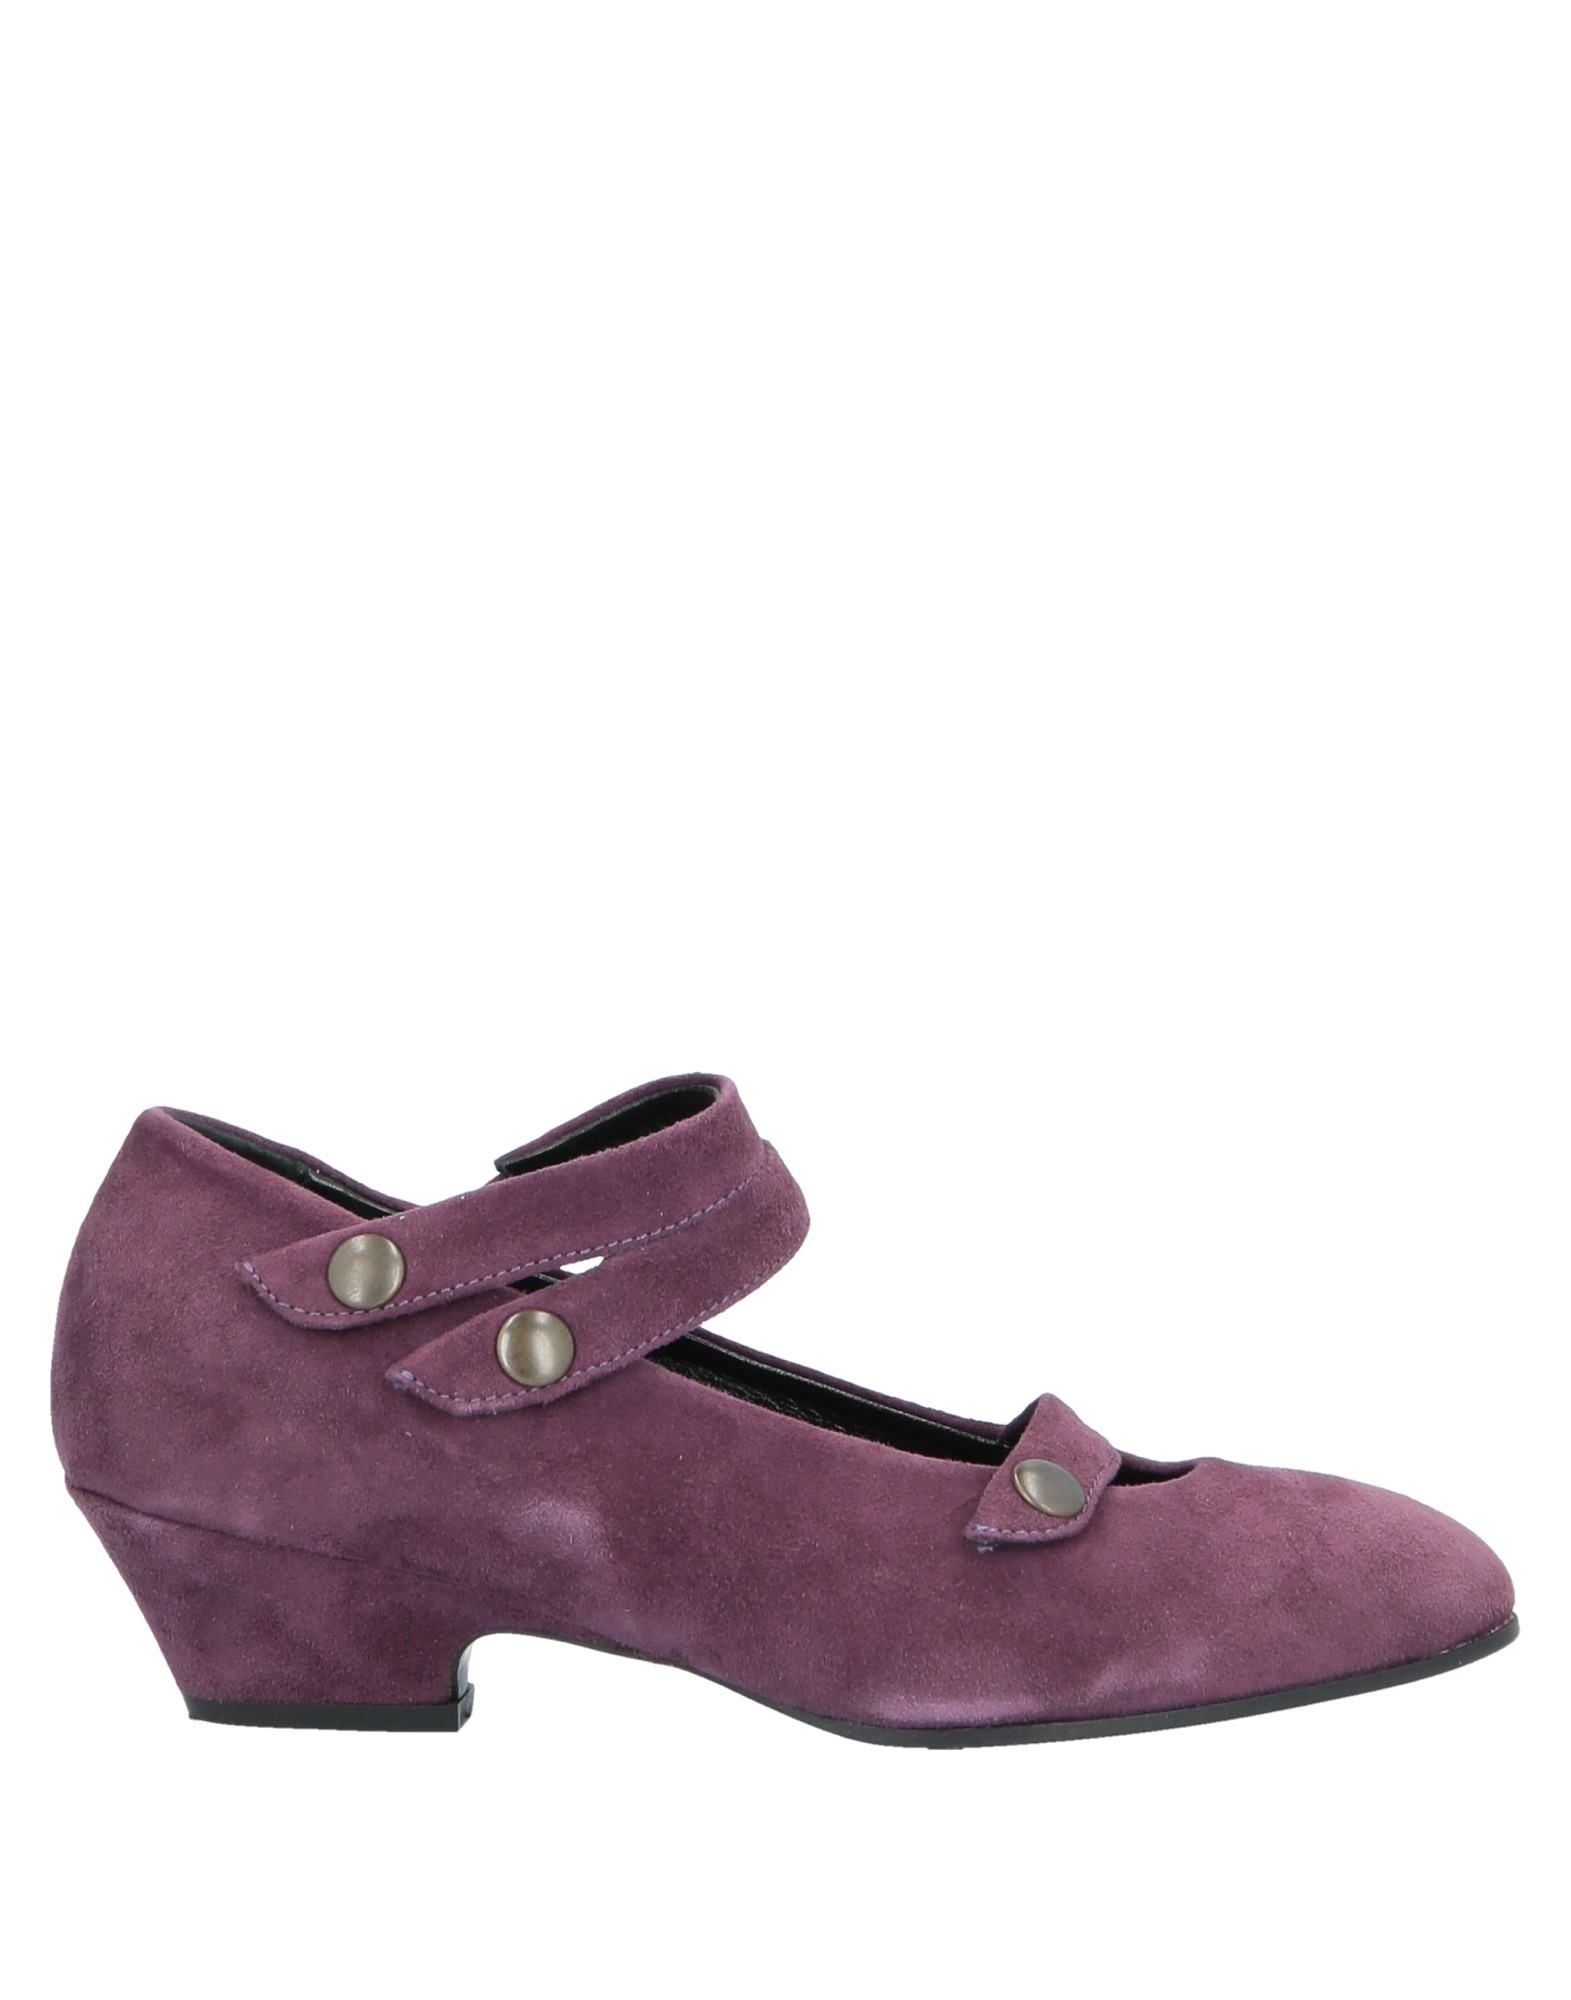 Фото - QSP+ QUELQUES SHOES DE PLUS Балетки women high heel shoes platform pumps woman thin high heels party wedding shoes ladies kitten heels plus size 34 40 41 42 43